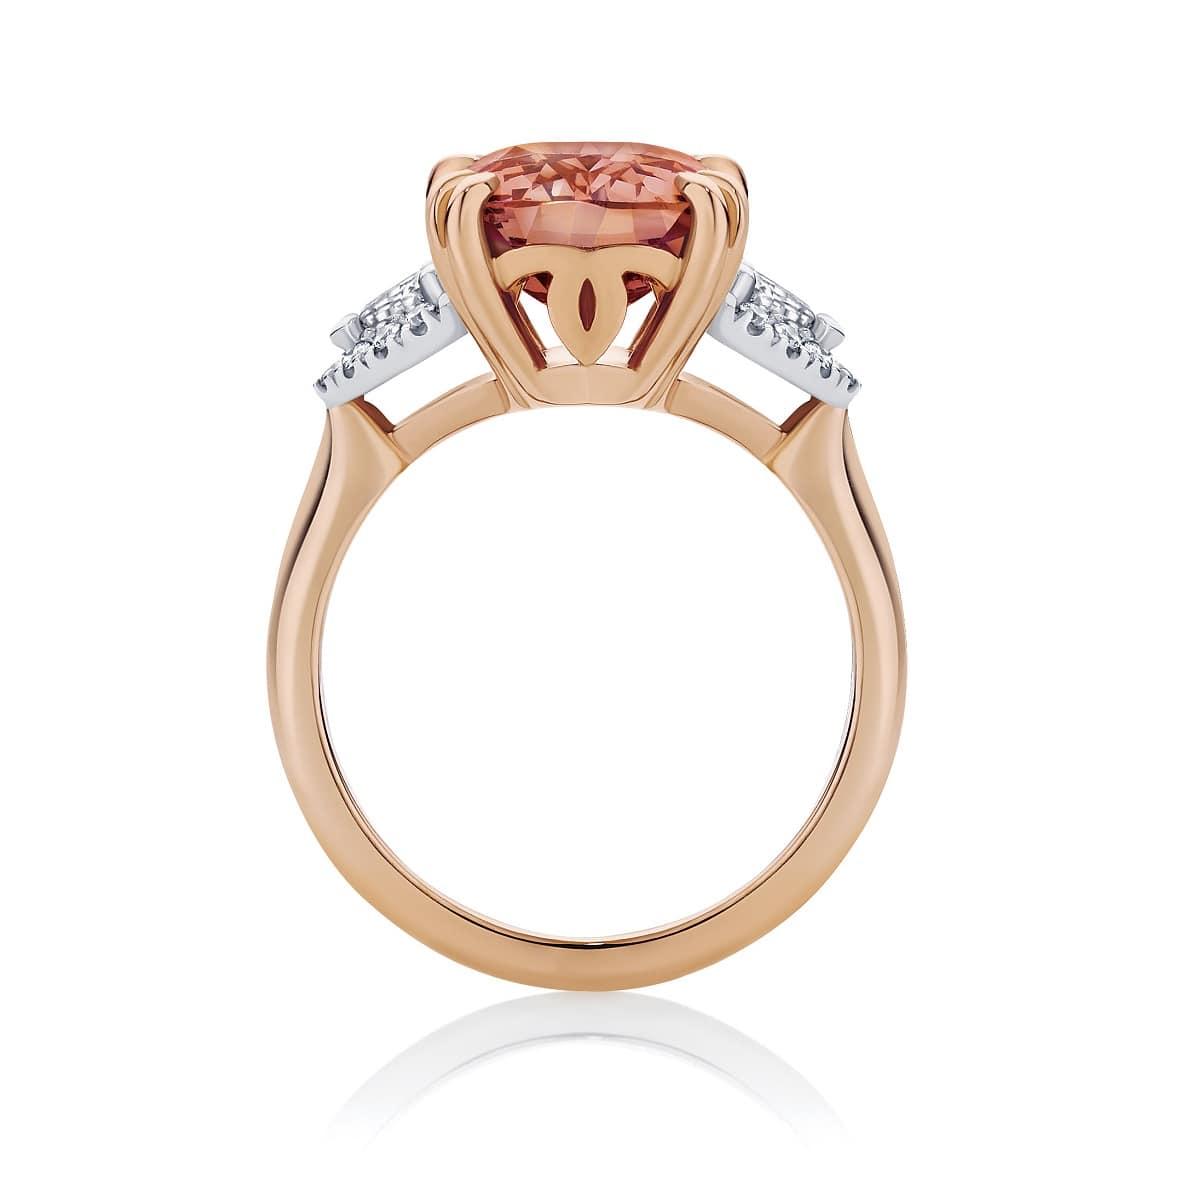 nick cummins bachelor ring